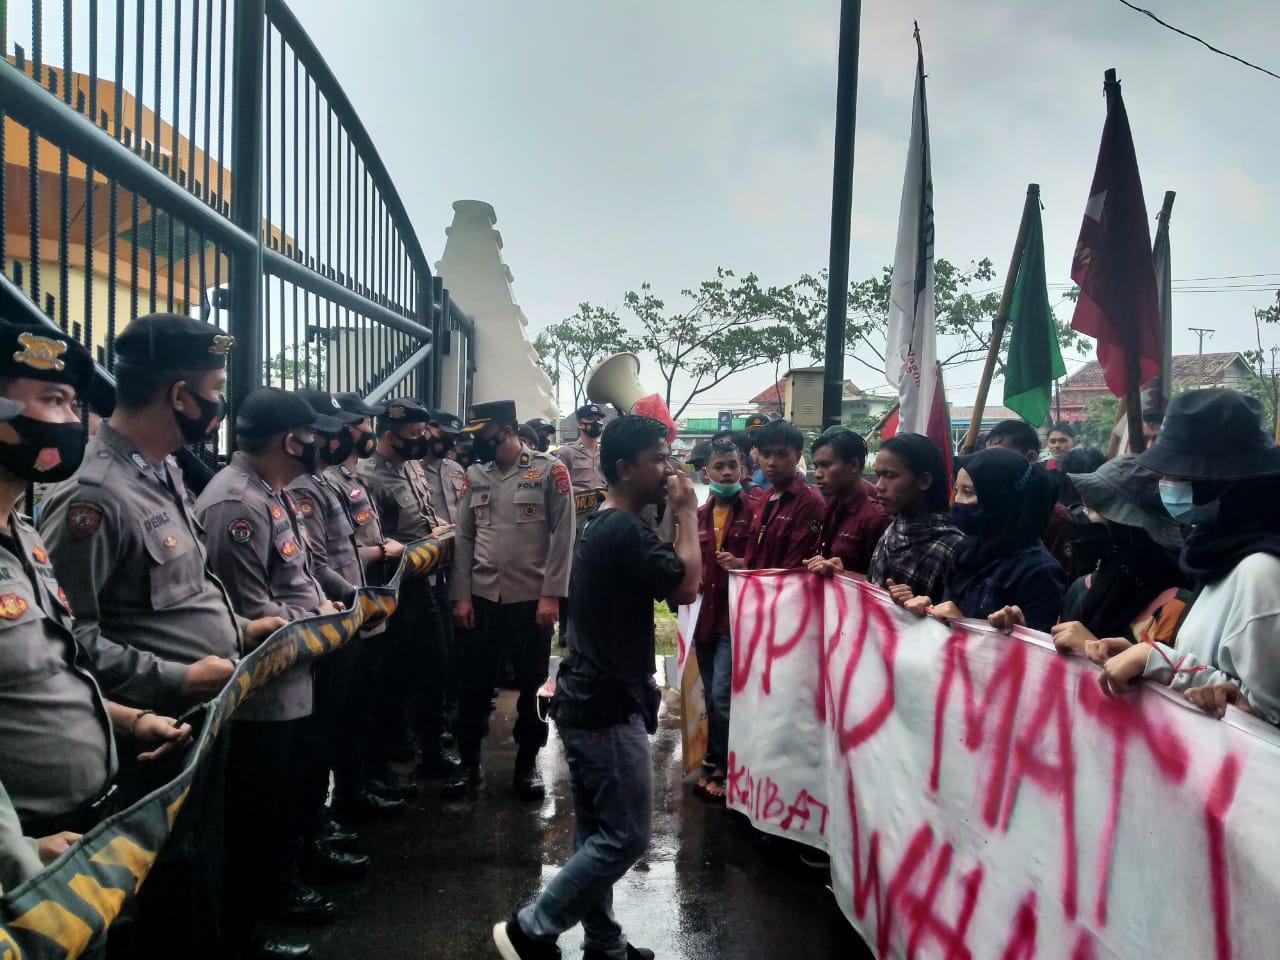 Gambar Ditengah Guyuran Hujan, Polres Serang Kota Kawal Mahasiswa Tuntut Kejati Banten Periksa Sekda dan Banggar 15